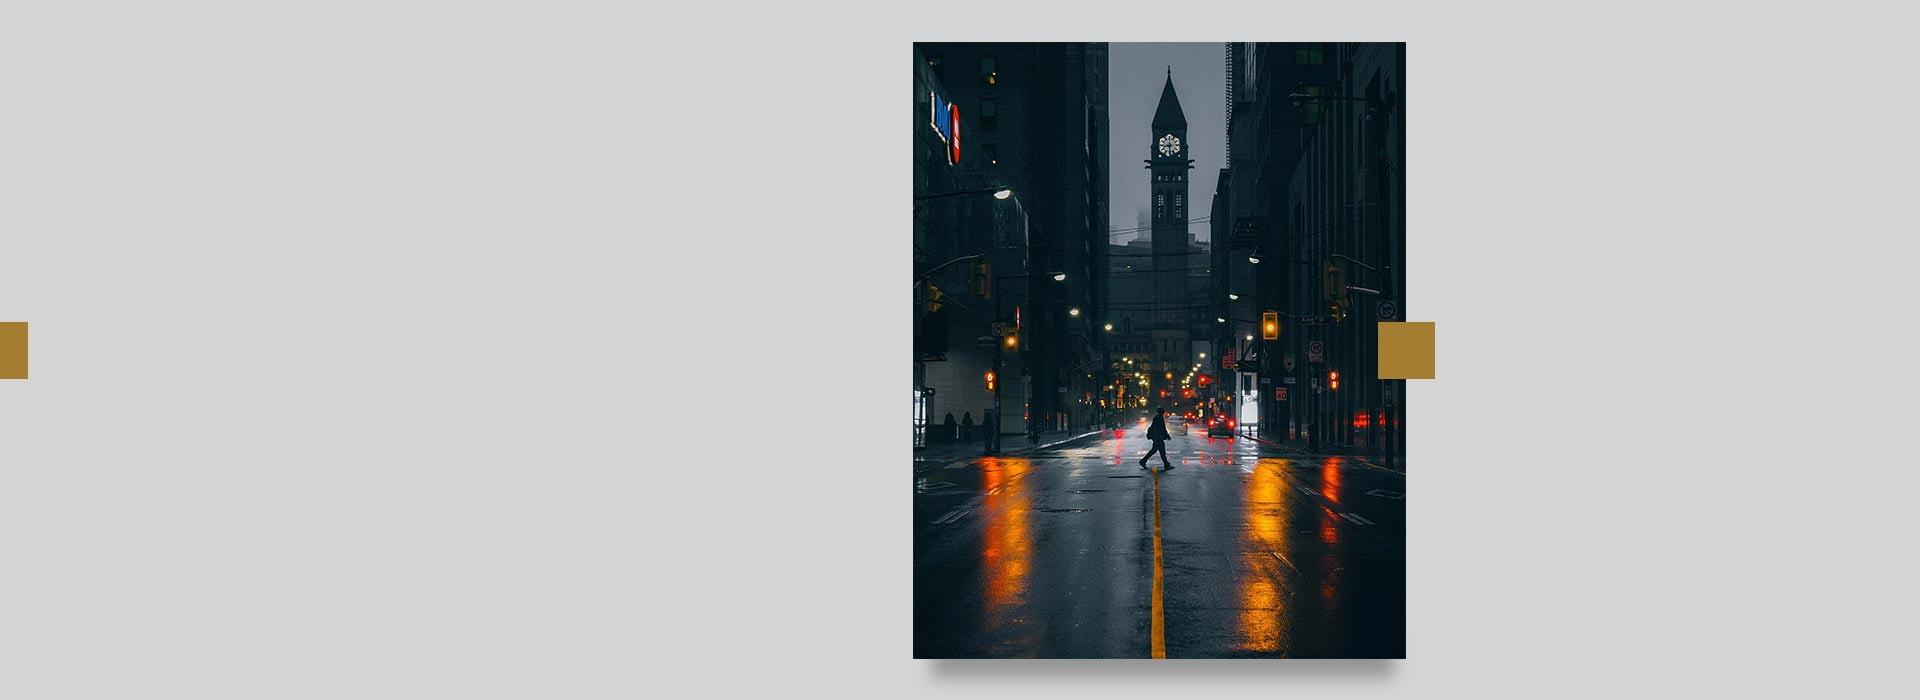 night photography Introduction 3 - عکاسی در شب